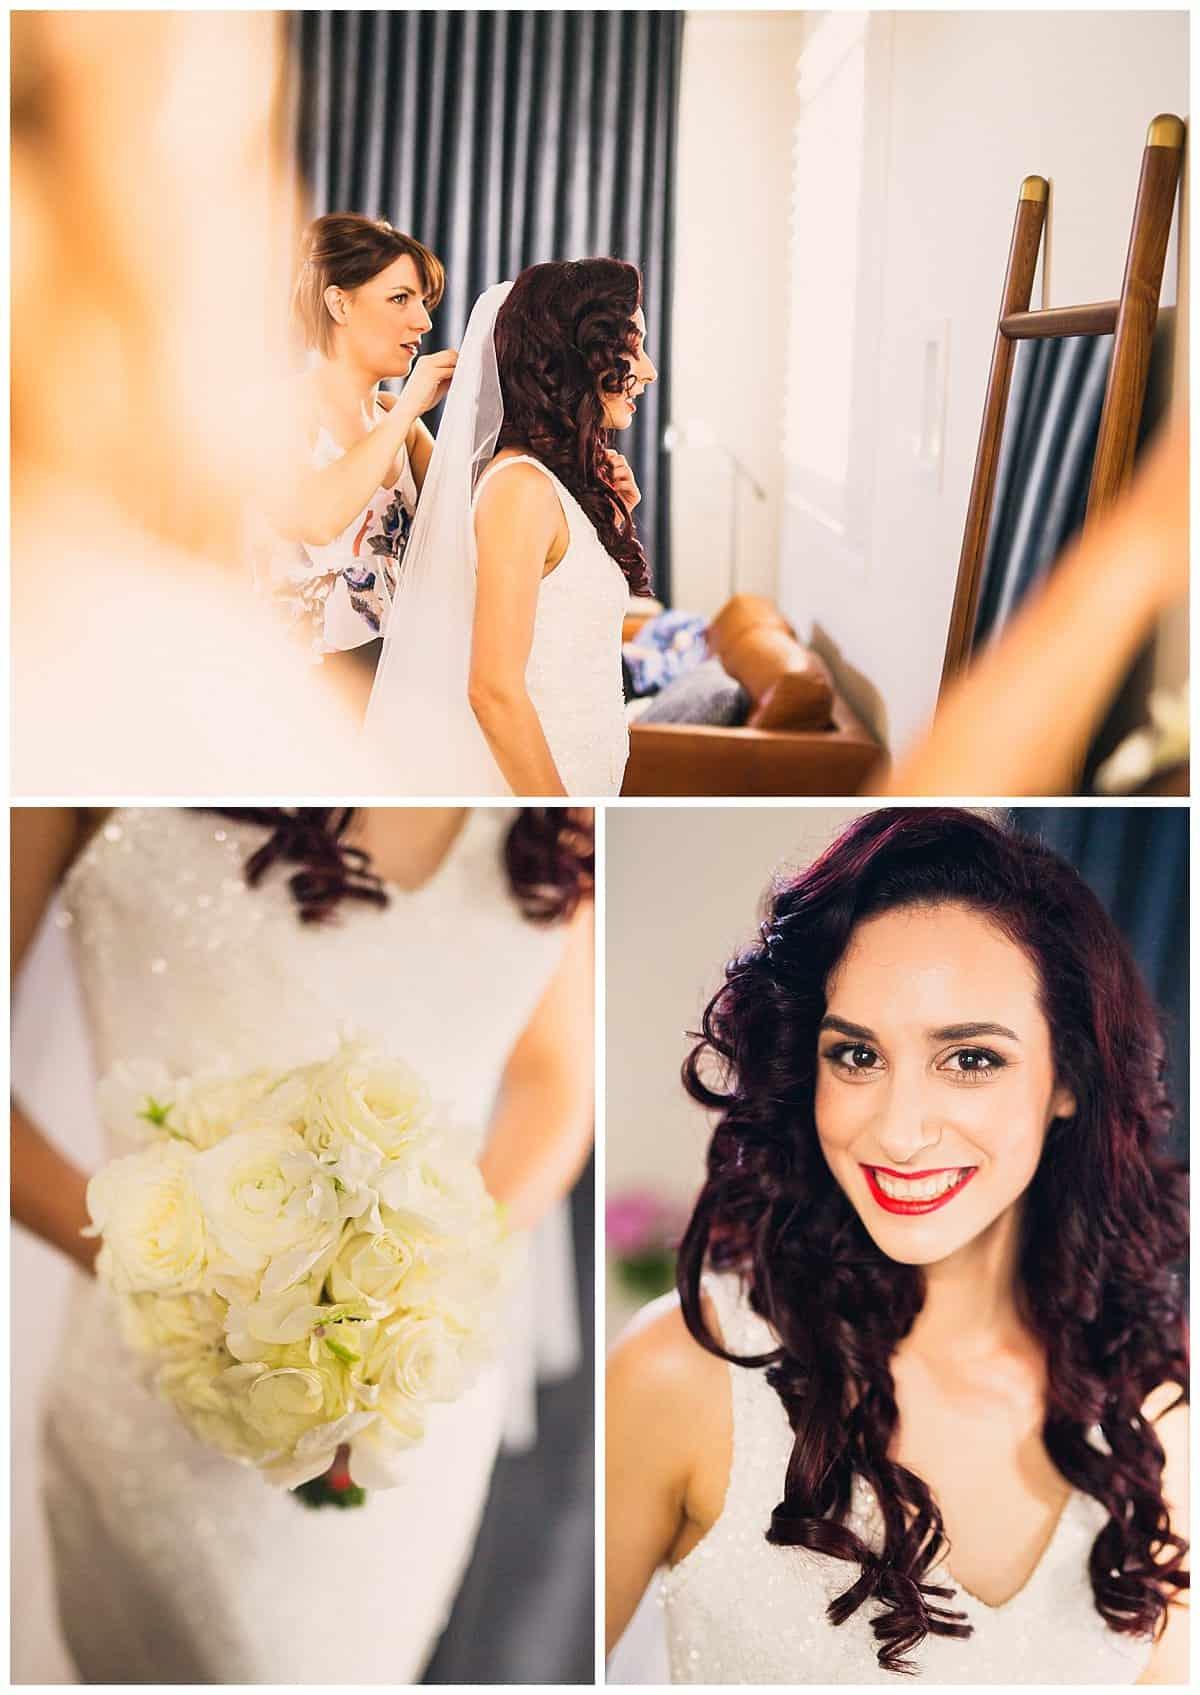 Natasa Getting Ready - Beautiful White Rose Wedding Bouquet